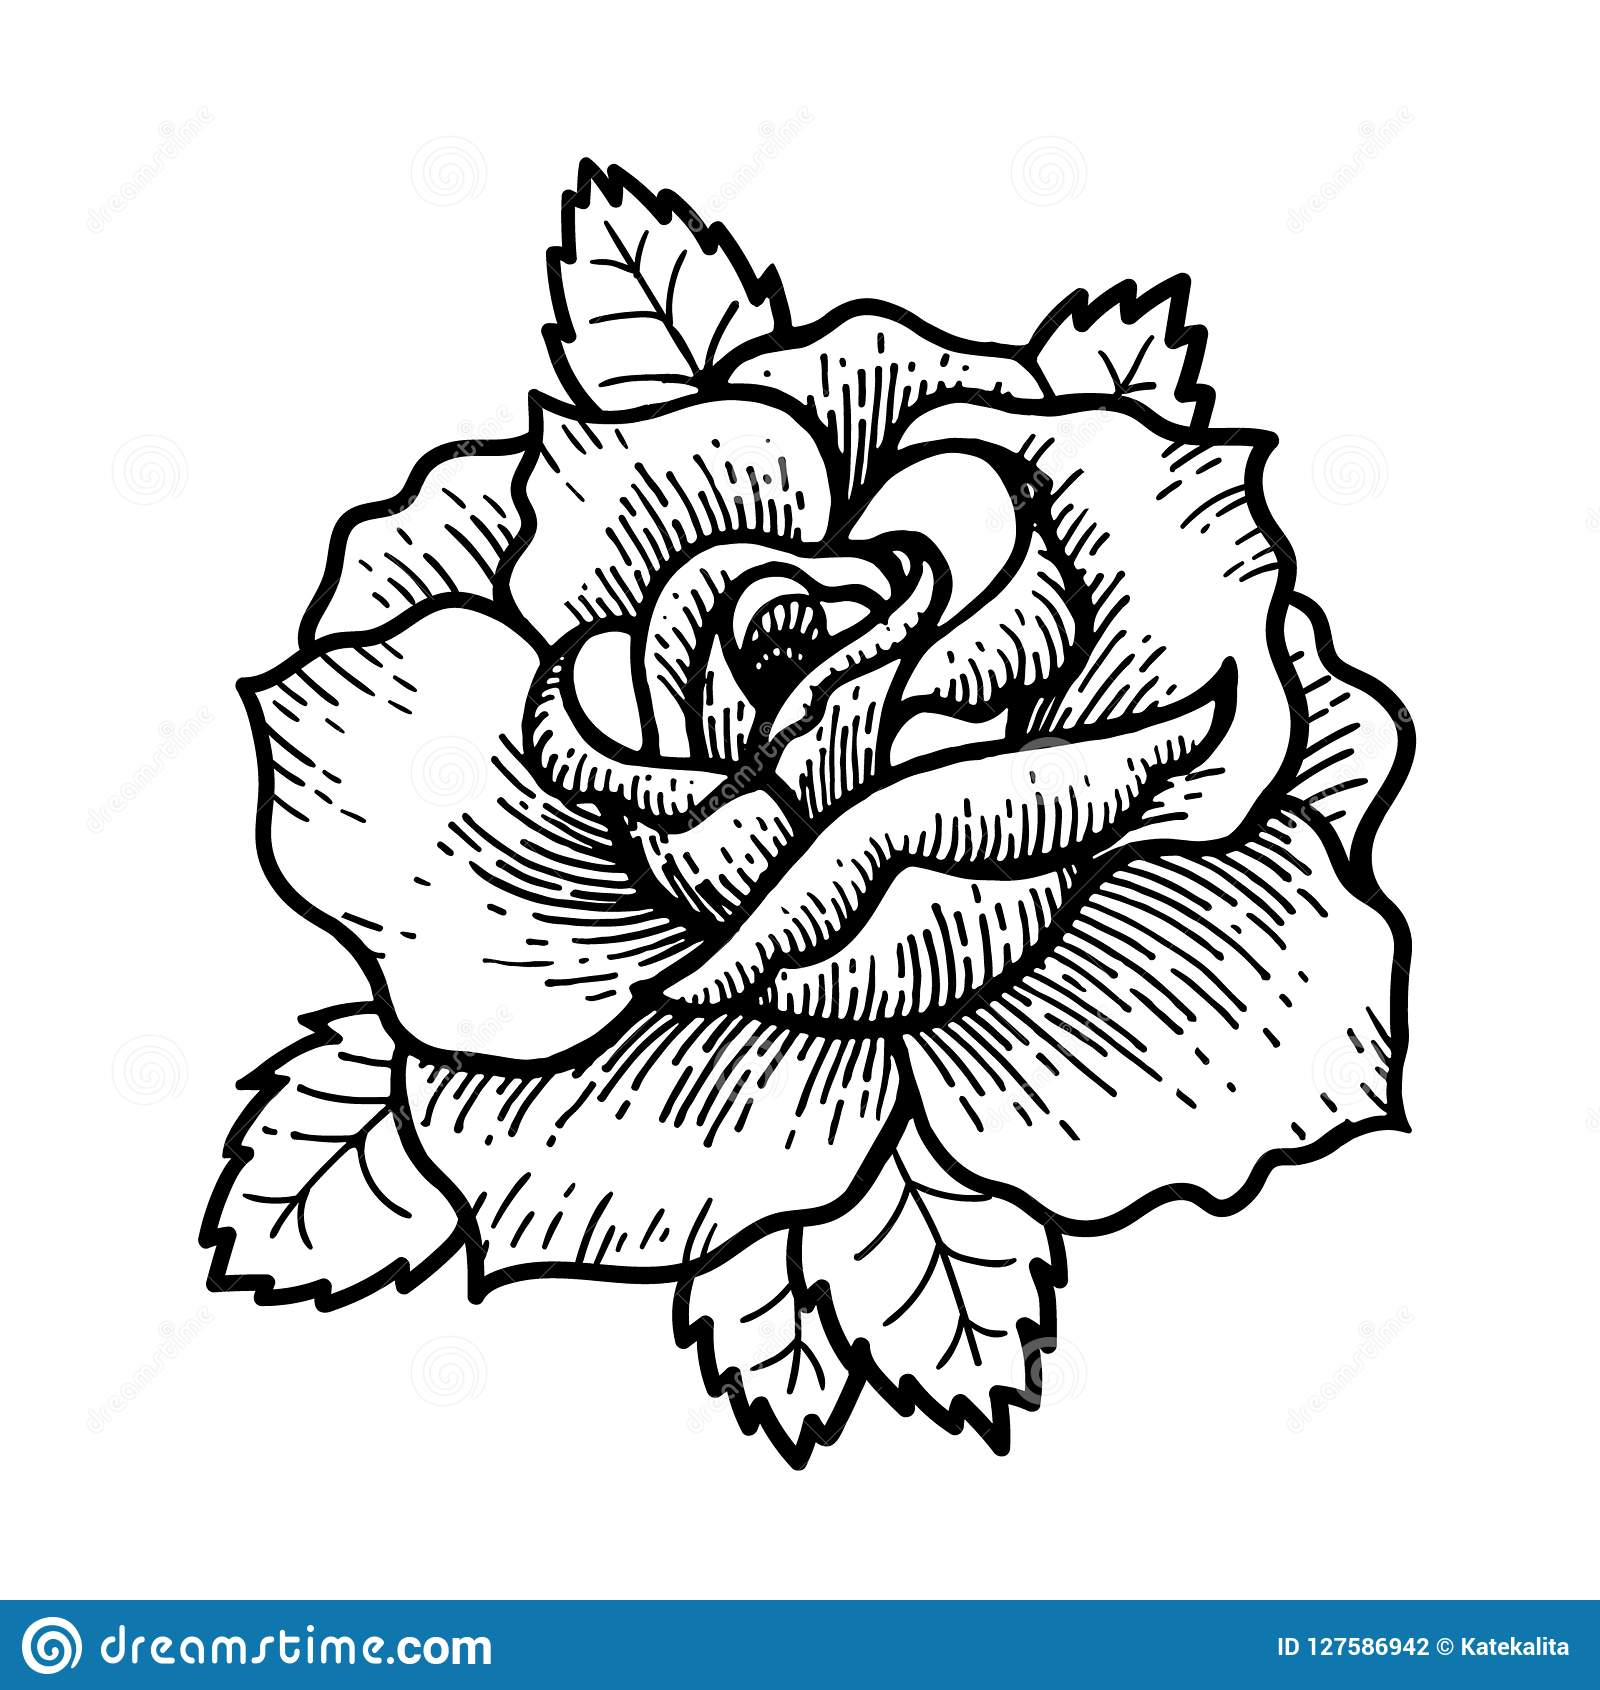 Tattoo Rose FlowerTattoo Mystic Symbol Boho Print Poster T Shirt Textiles Vector Illustration Art Vintage Engraving Style Traditional